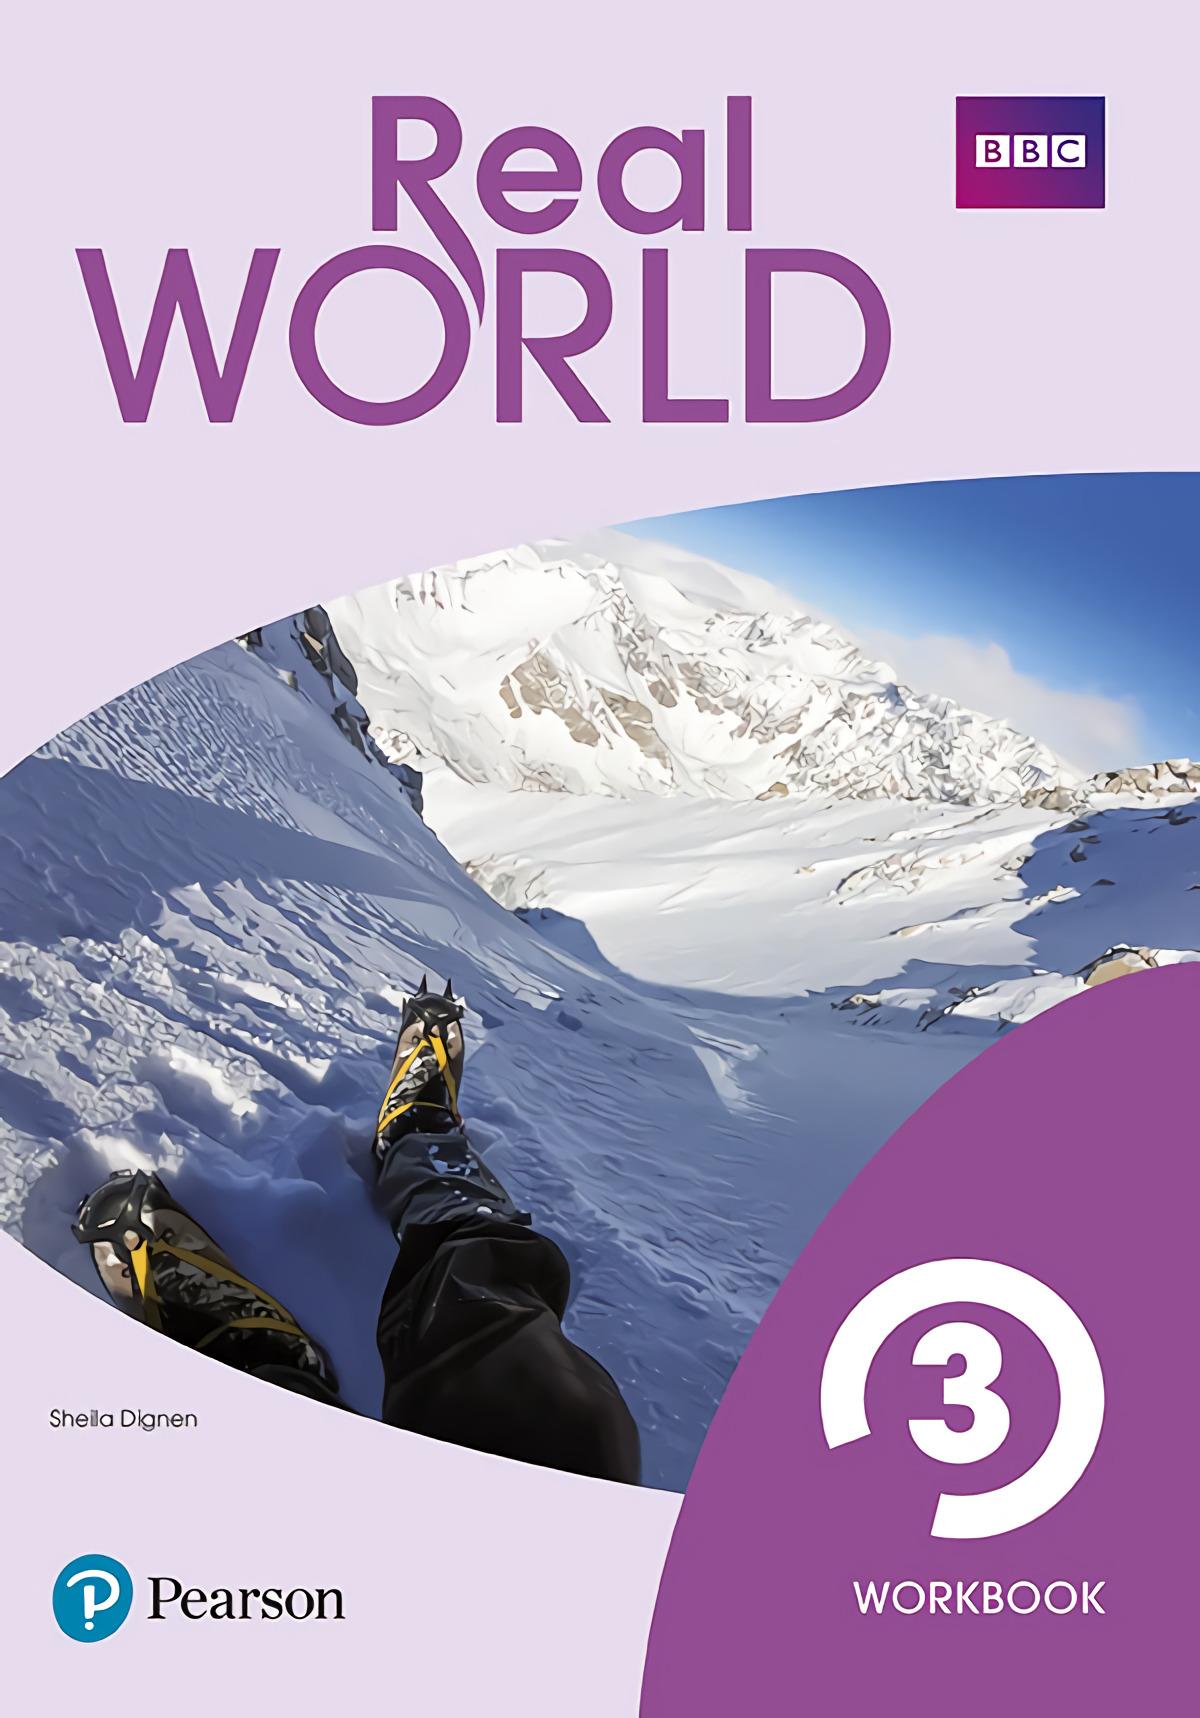 Real World 3 Workbook Print